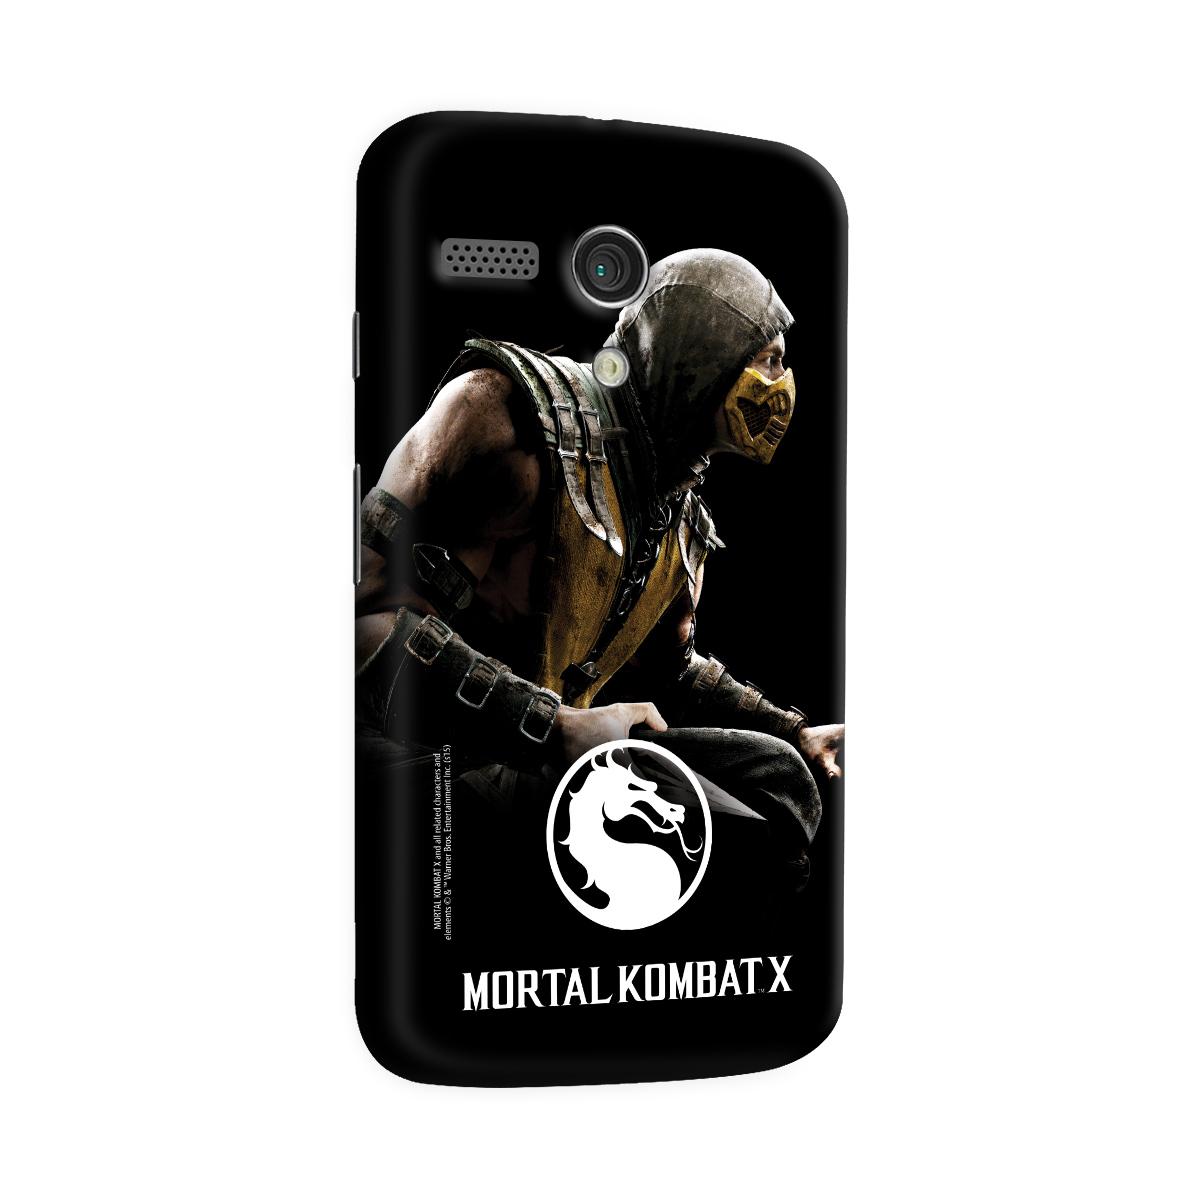 Capa para Motorola Moto G 1 Mortal Kombat X Capa